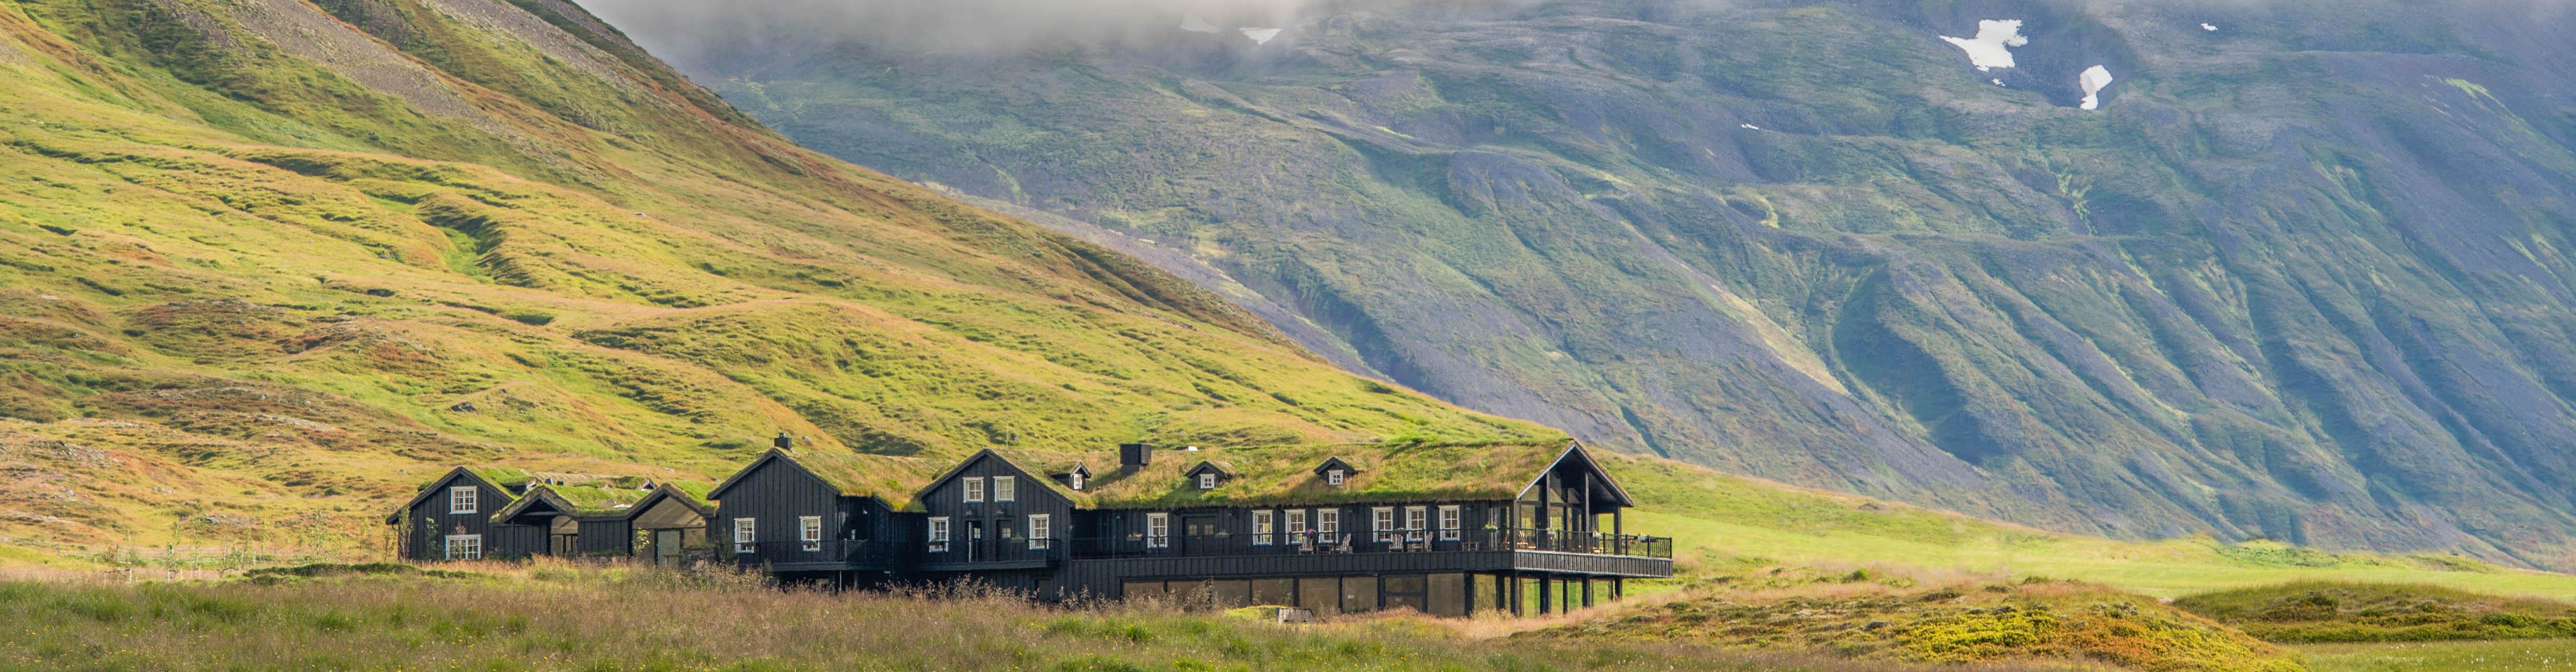 H-Iceland-Deplar Farm-04Deplar_5